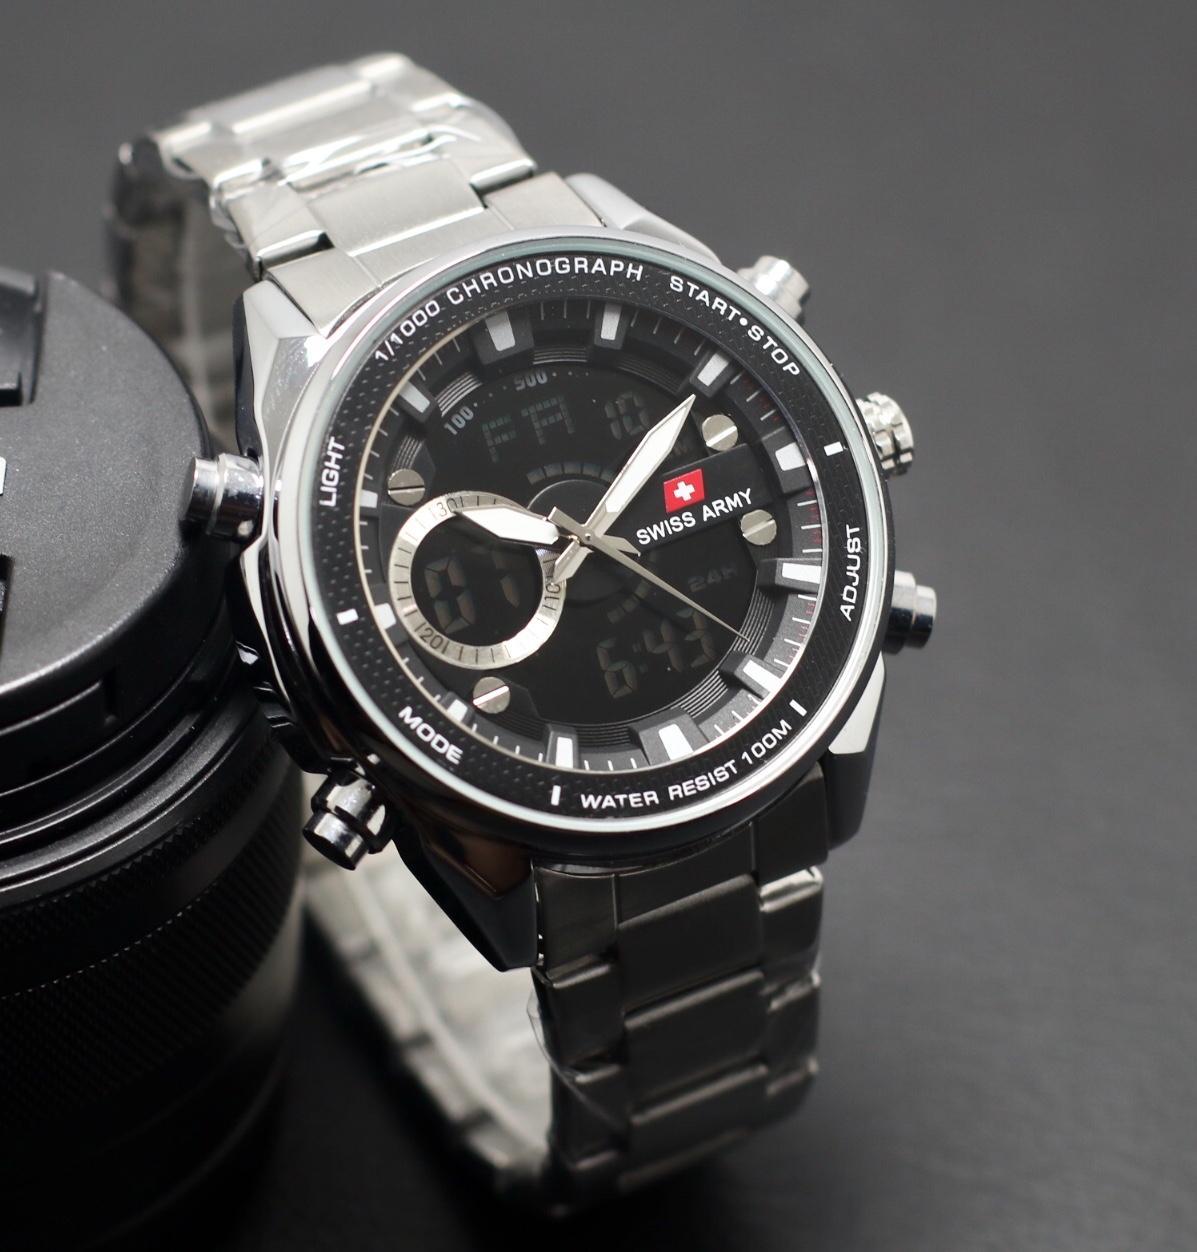 Jam Tangan pria - SWISS ARMY - SA 5526 SB - Dual time ( Analog &